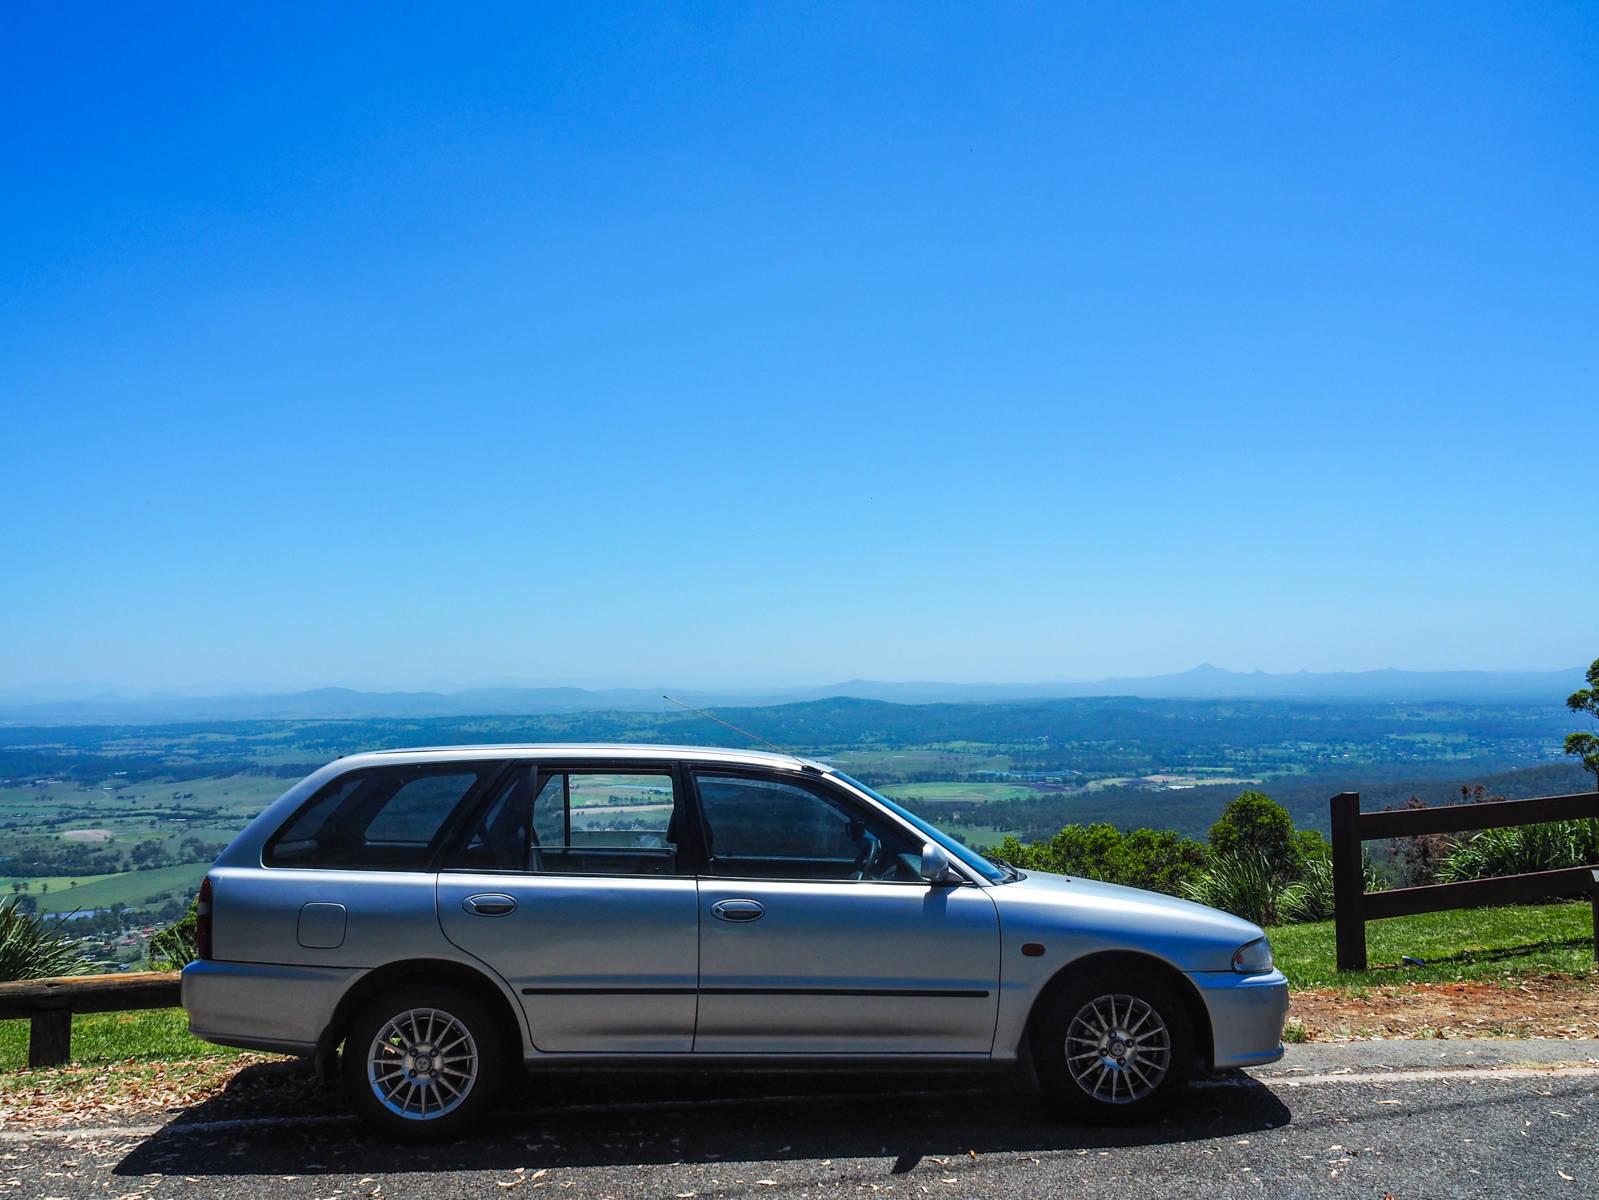 Achat voiture Australie - Mitsubishi